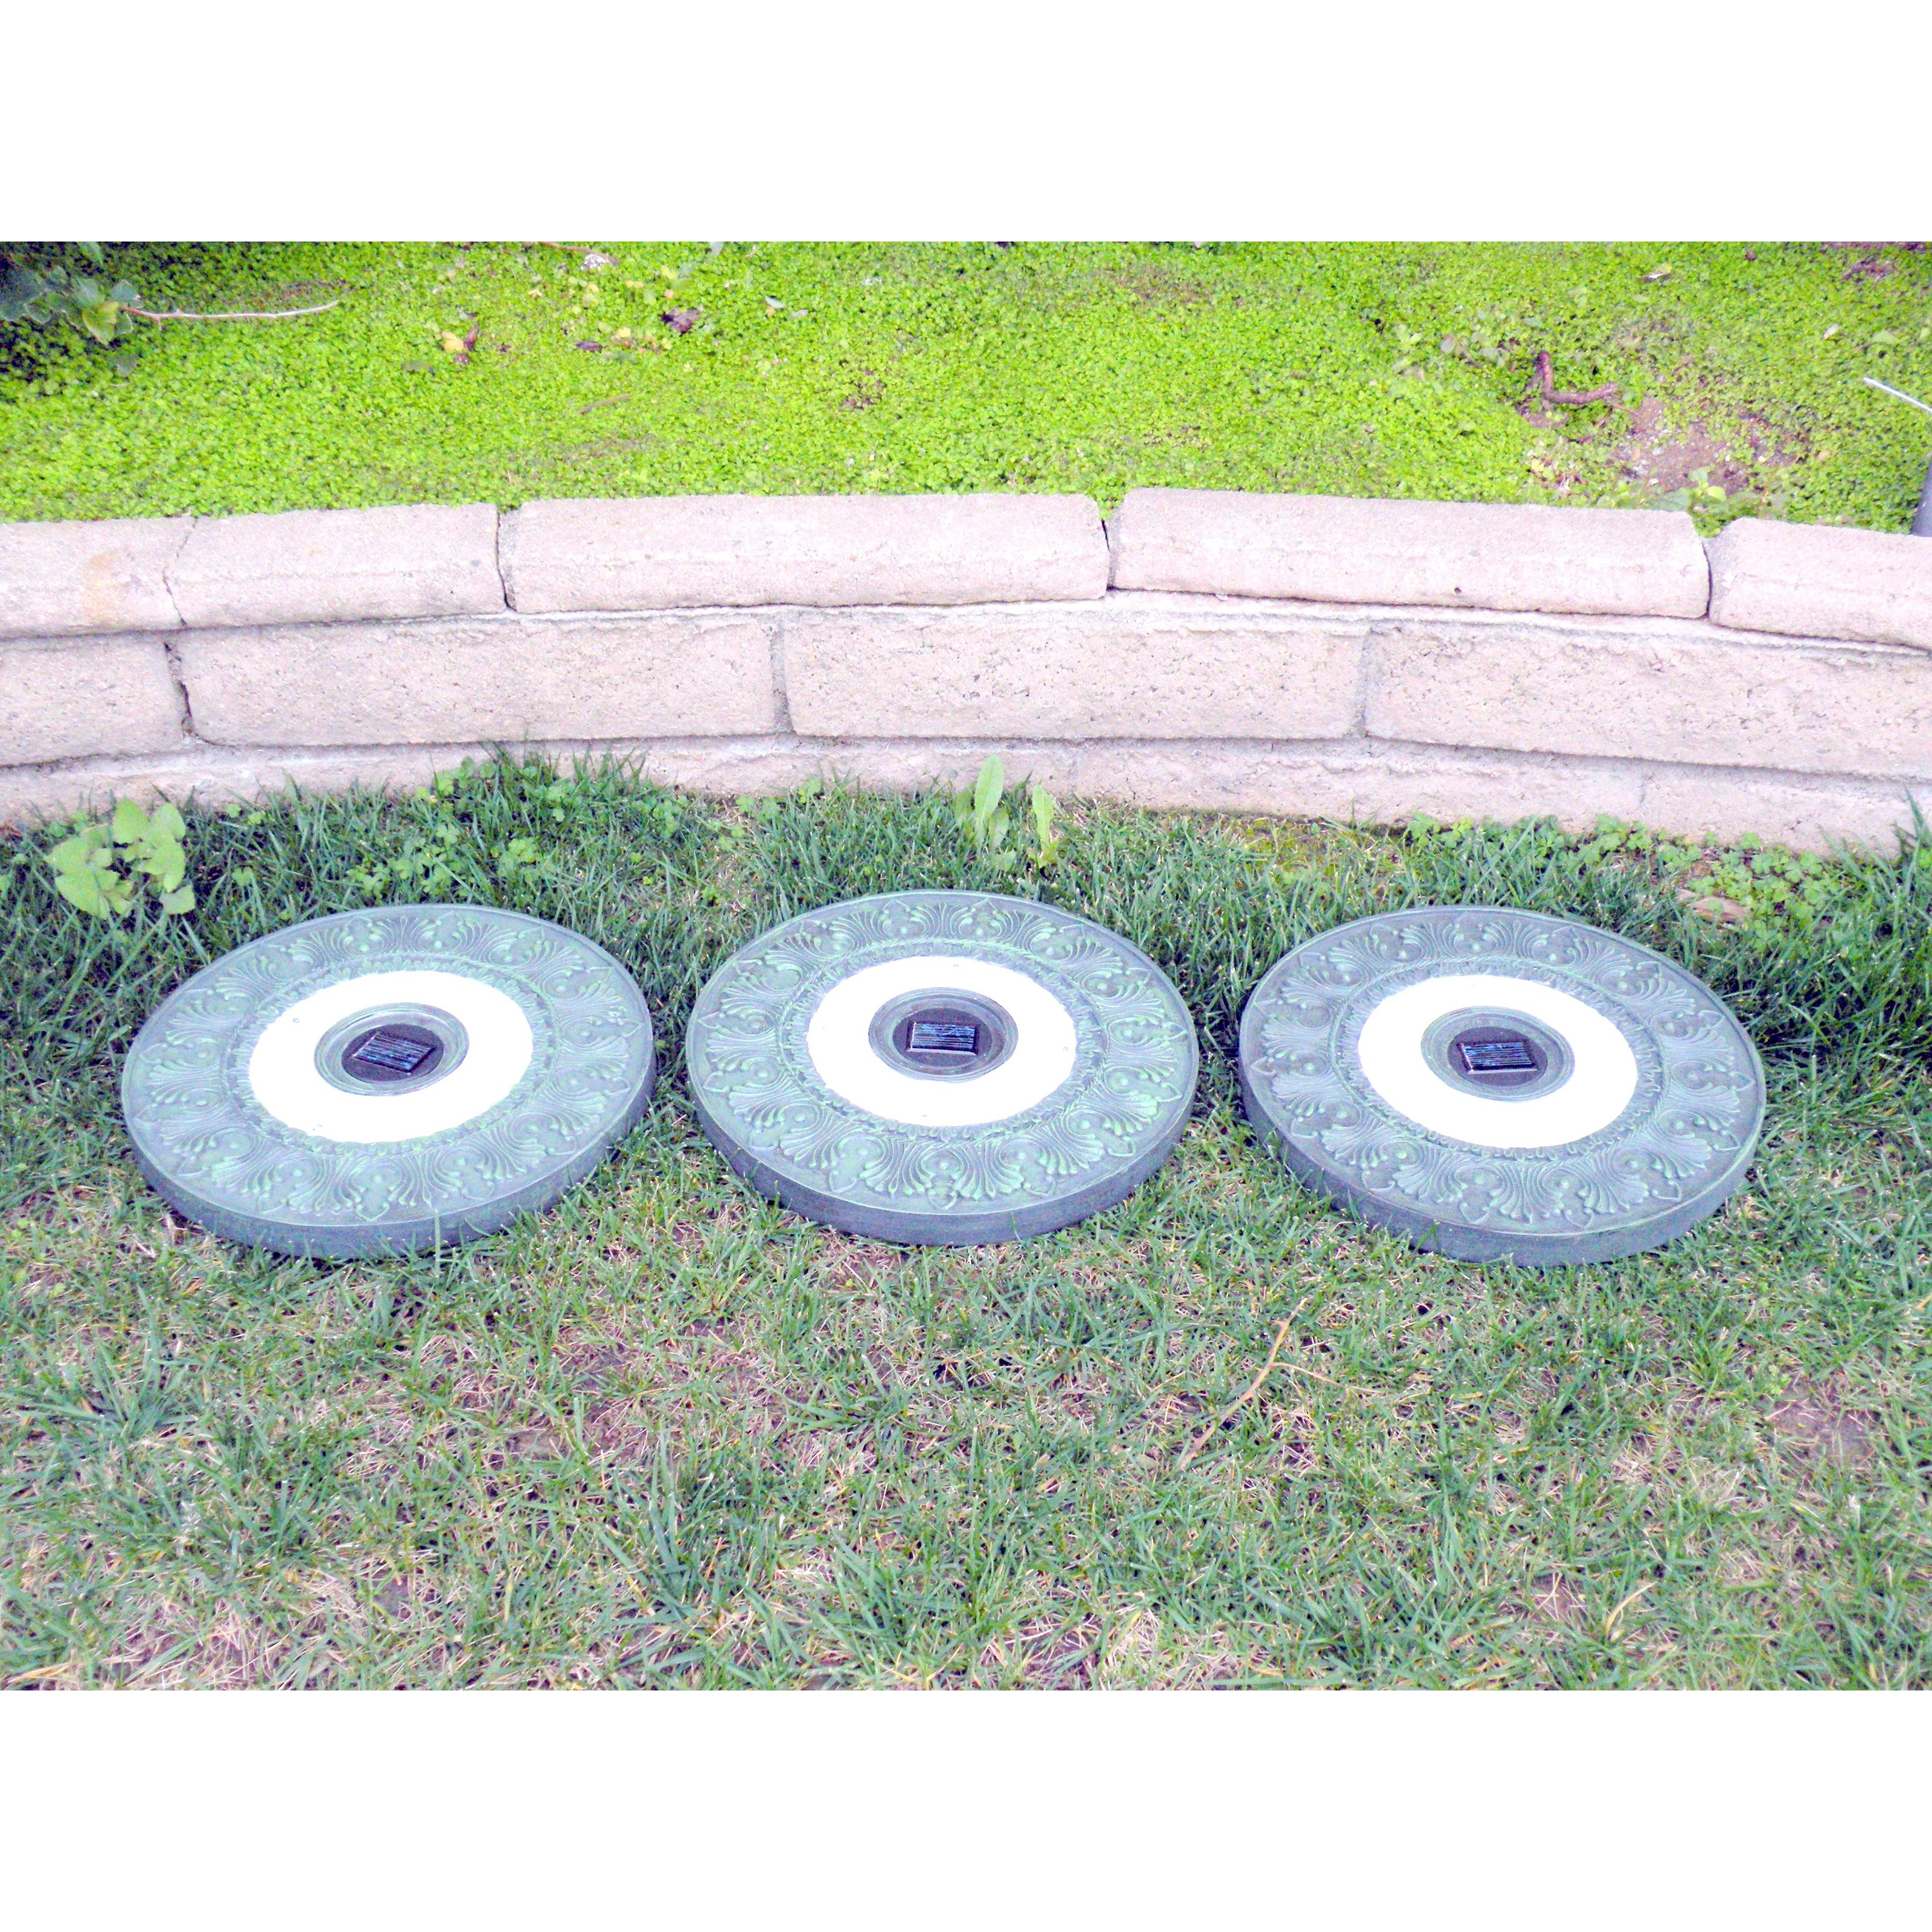 Homebrite Solar Power Round Garden Green Stepping Stones Set of 3 by Homebright Corporation